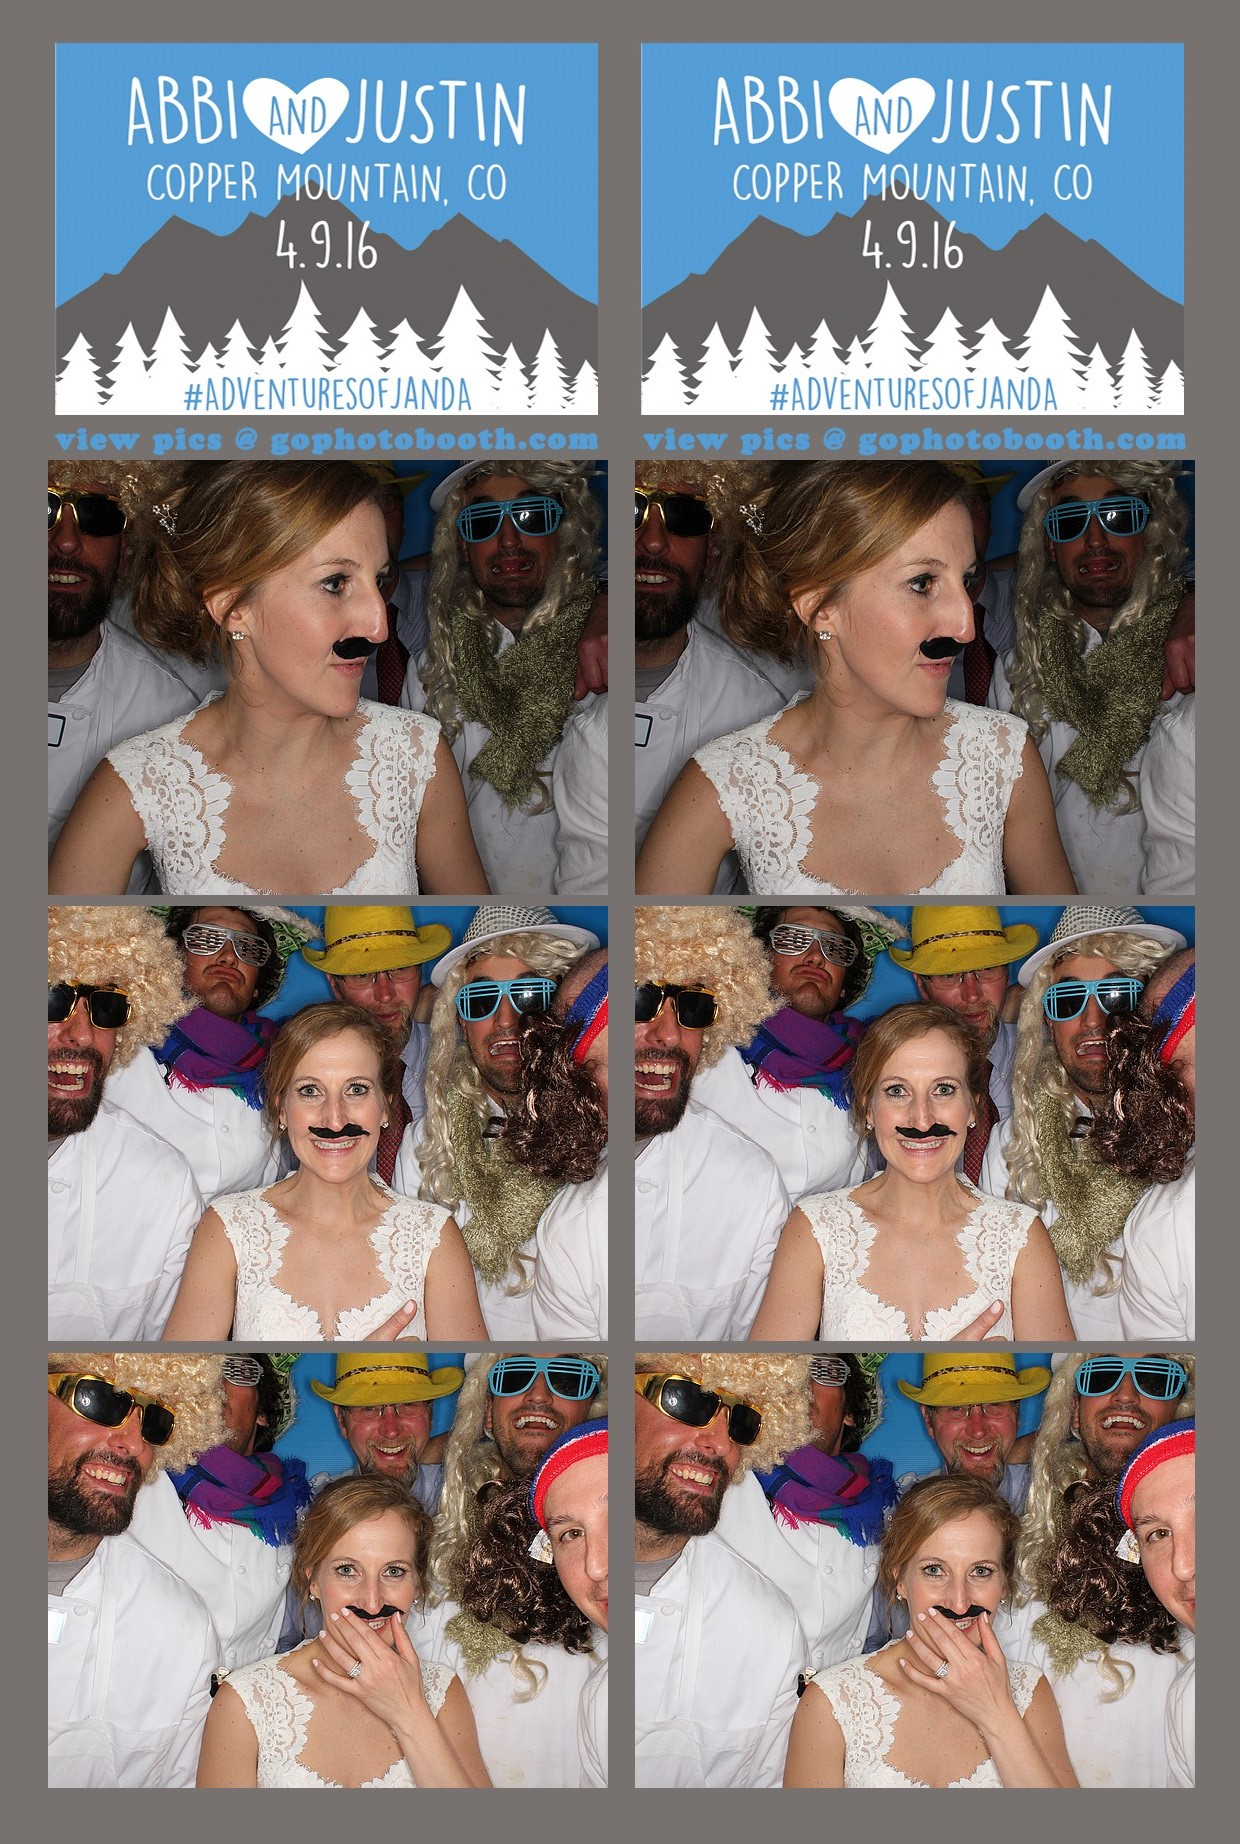 Abbi & Justin's Wedding photo booth 04/09/16